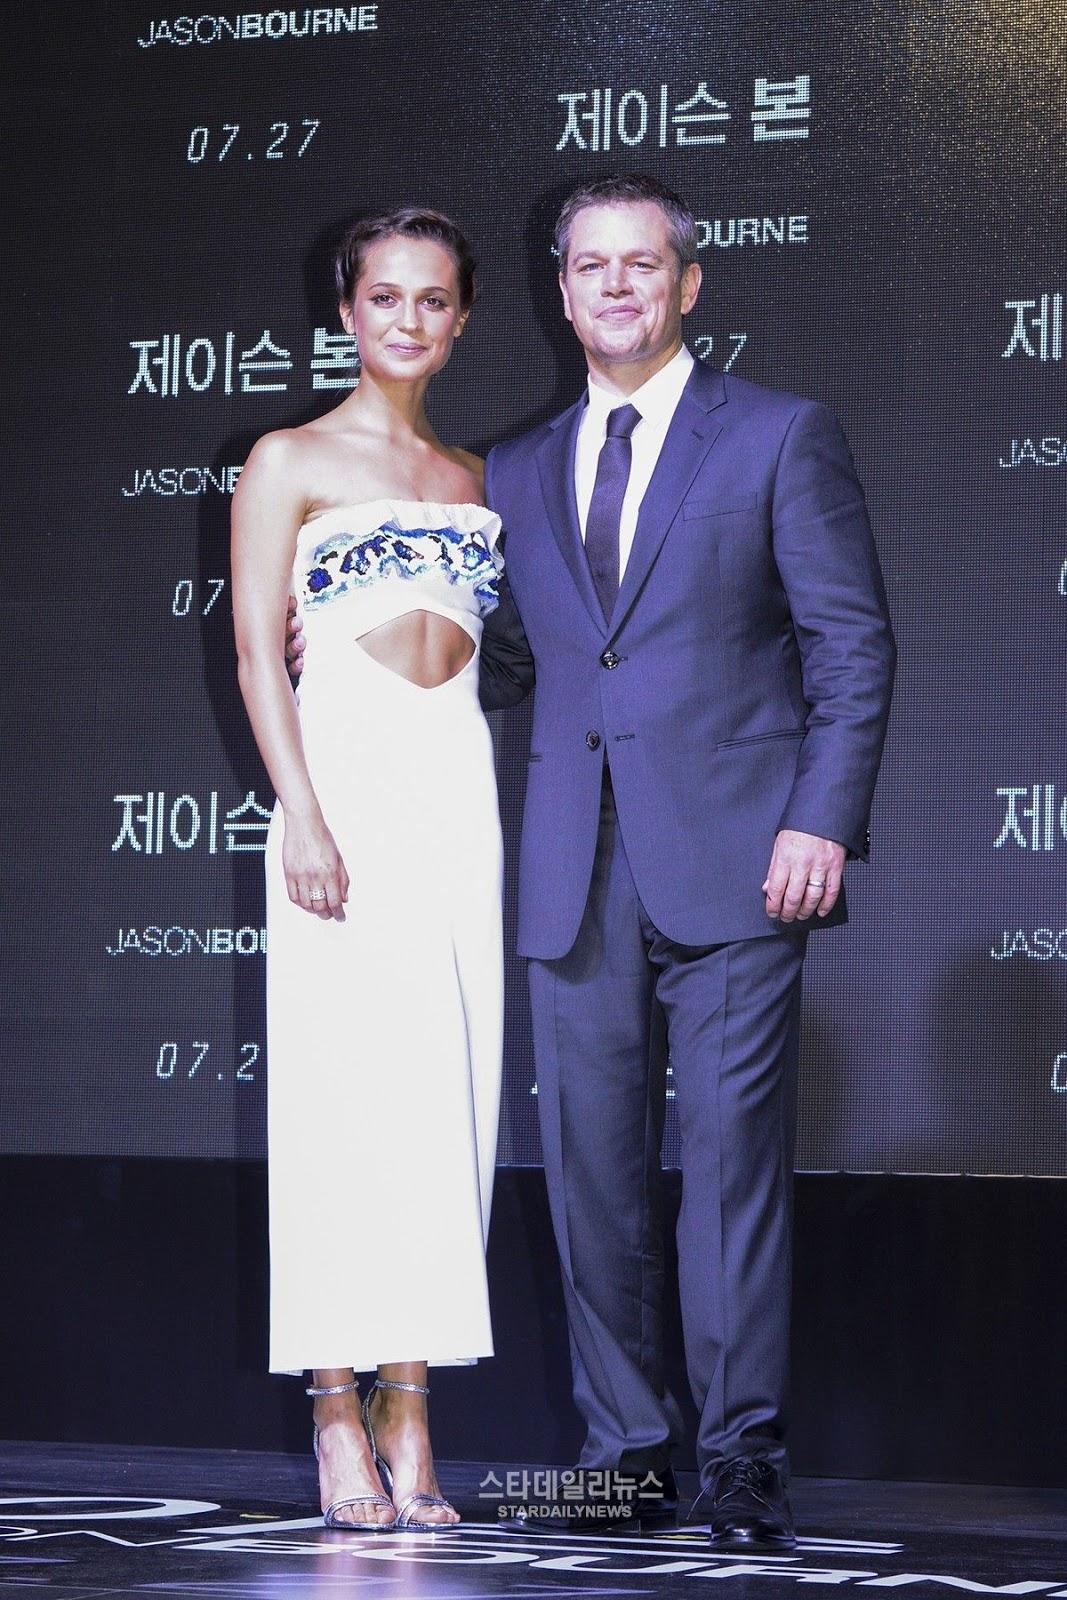 HQ Photos of Alicia Vikander a Jason Bourne Premiere in Sydney